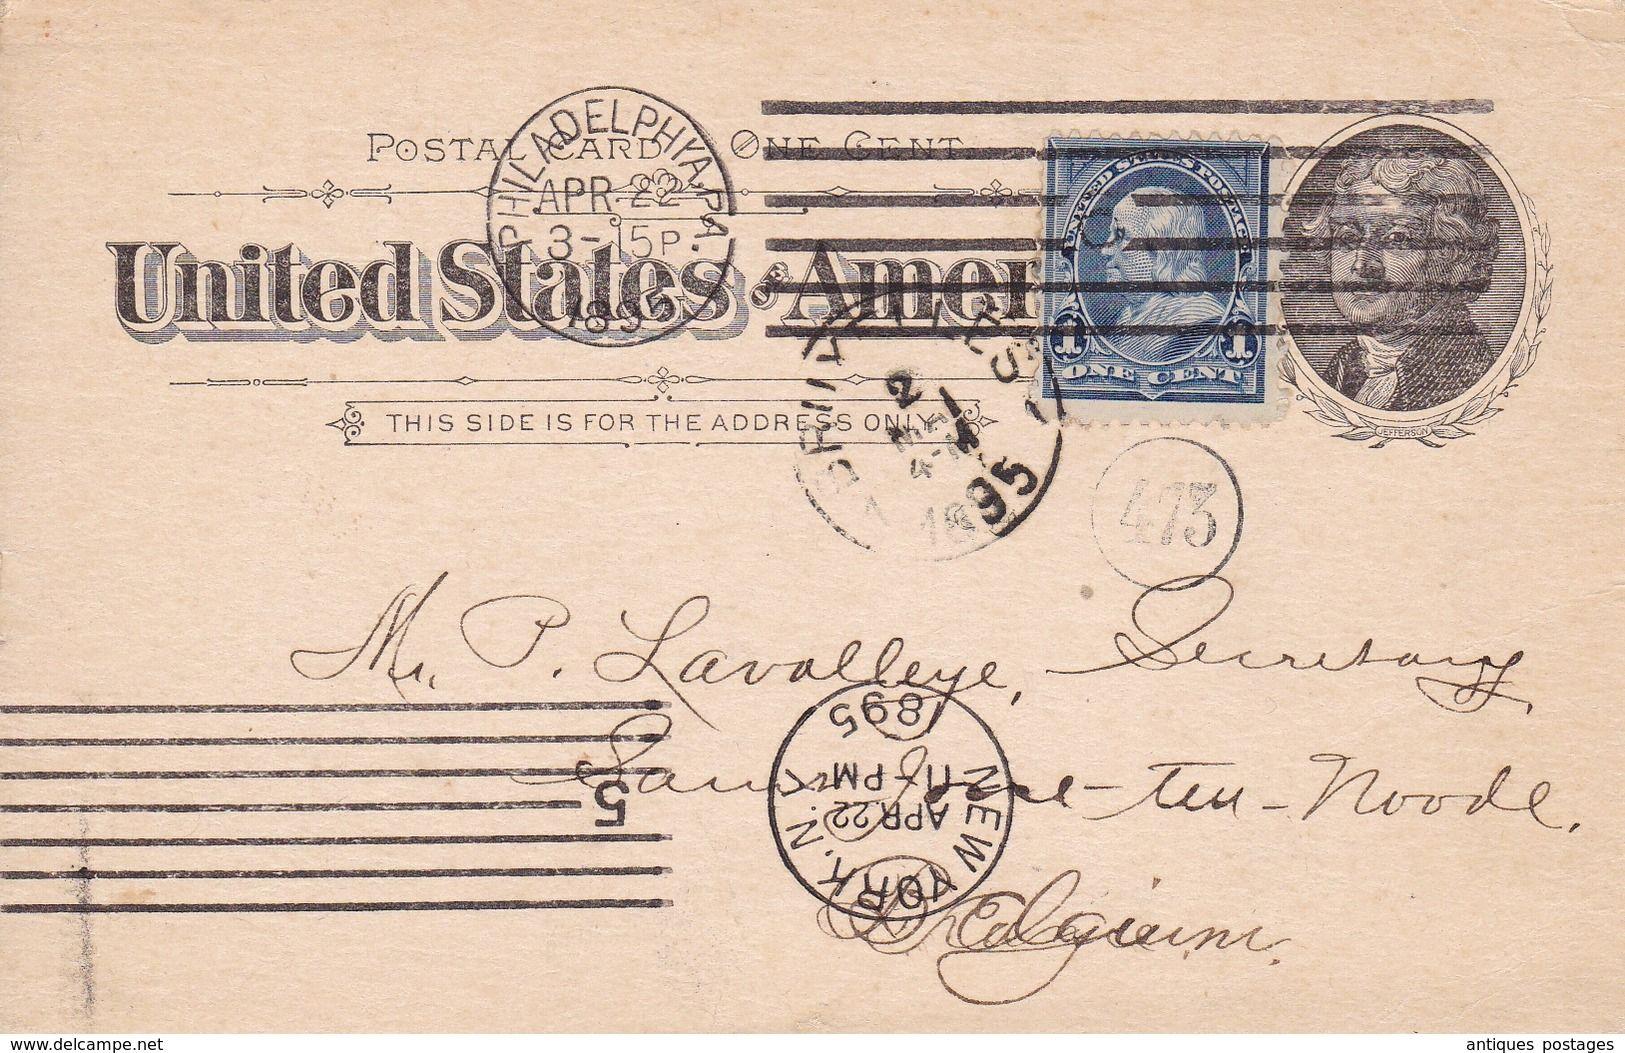 Carte USA 1895 State Board Of Health And Vital Statistics